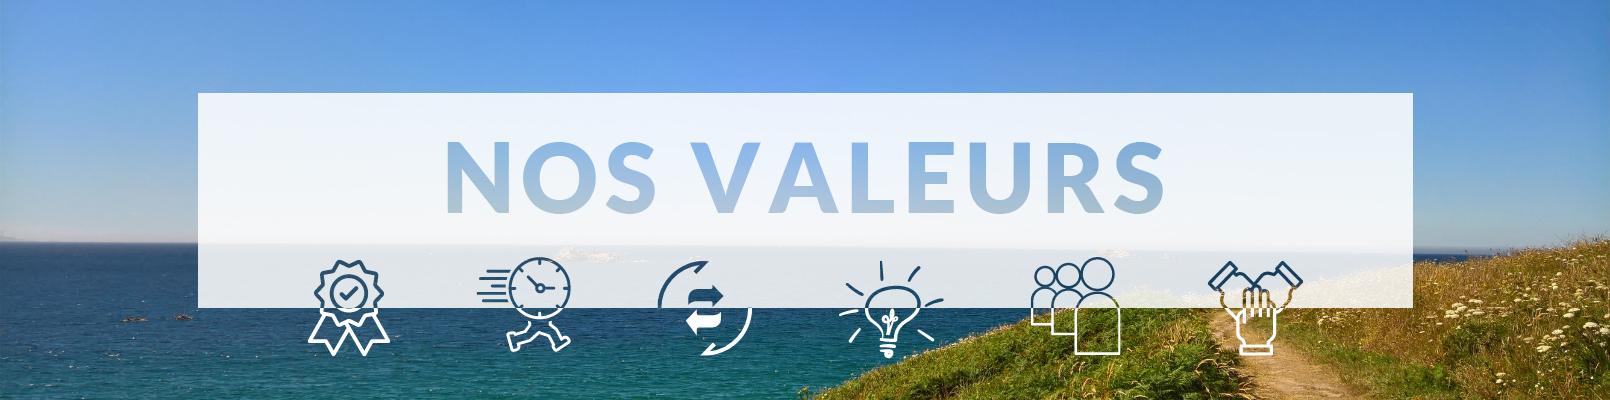 valeurs-entreprise-guedo